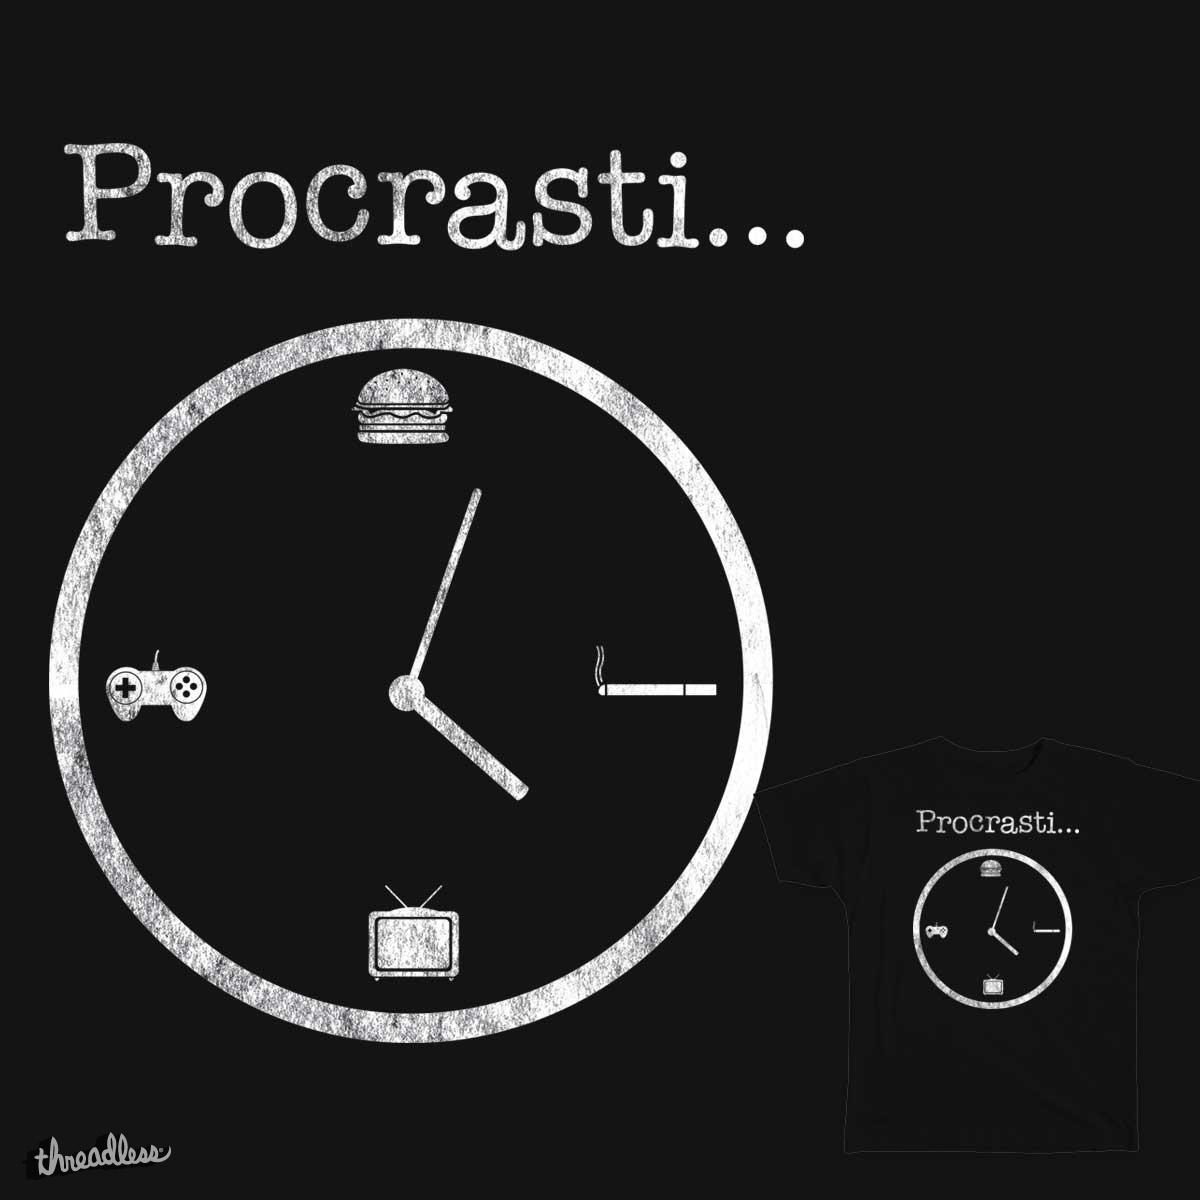 Procrasti... by dnice25 on Threadless